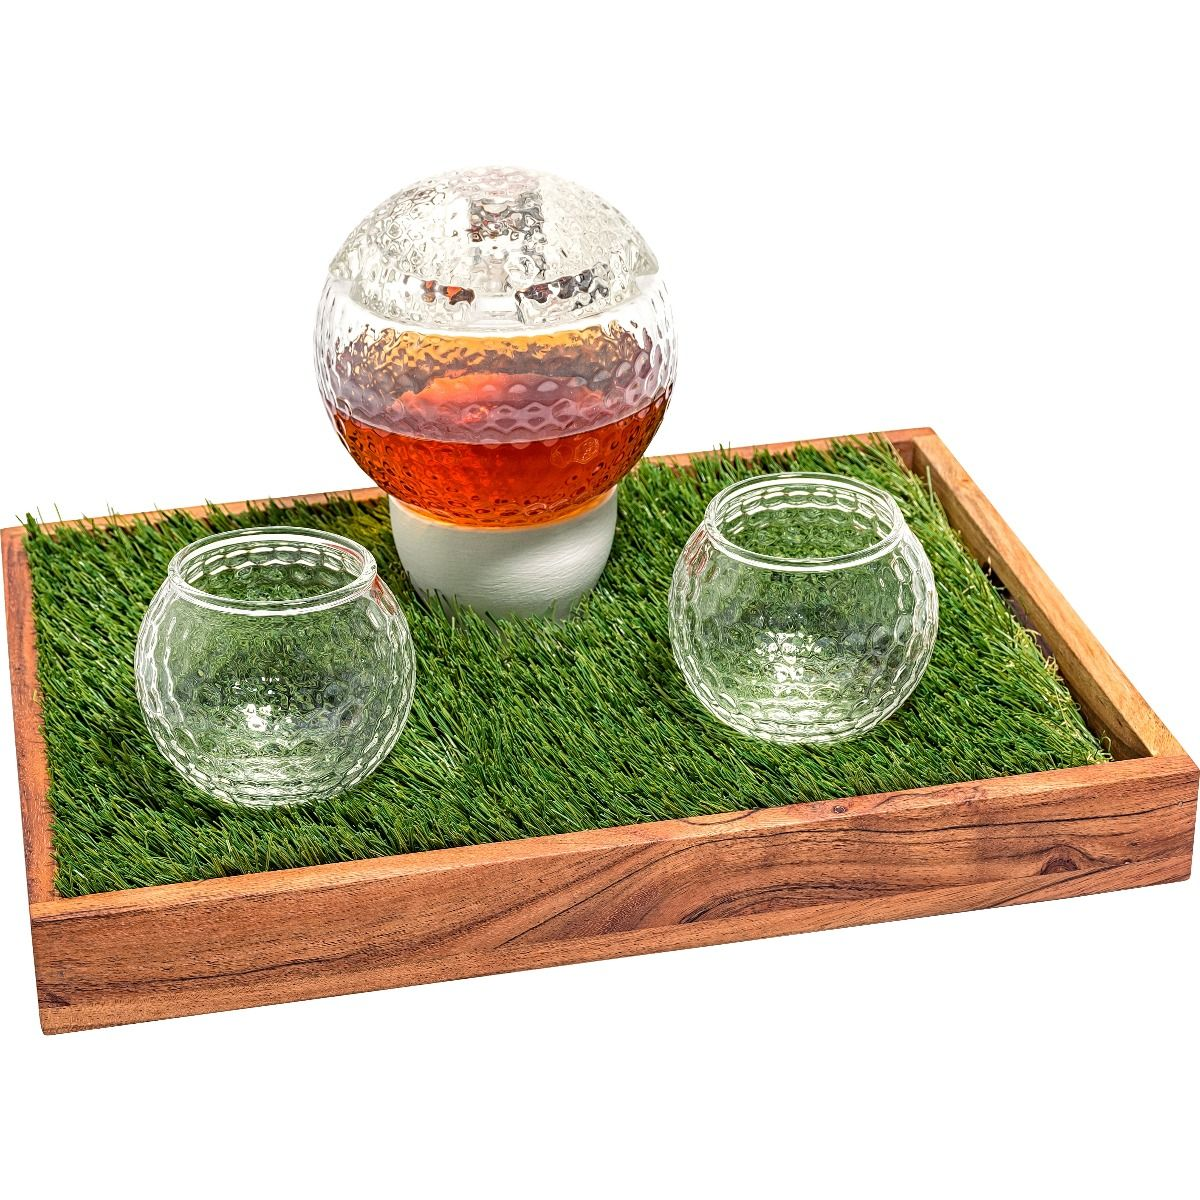 Prestige Decanters golf whiskey decanter set